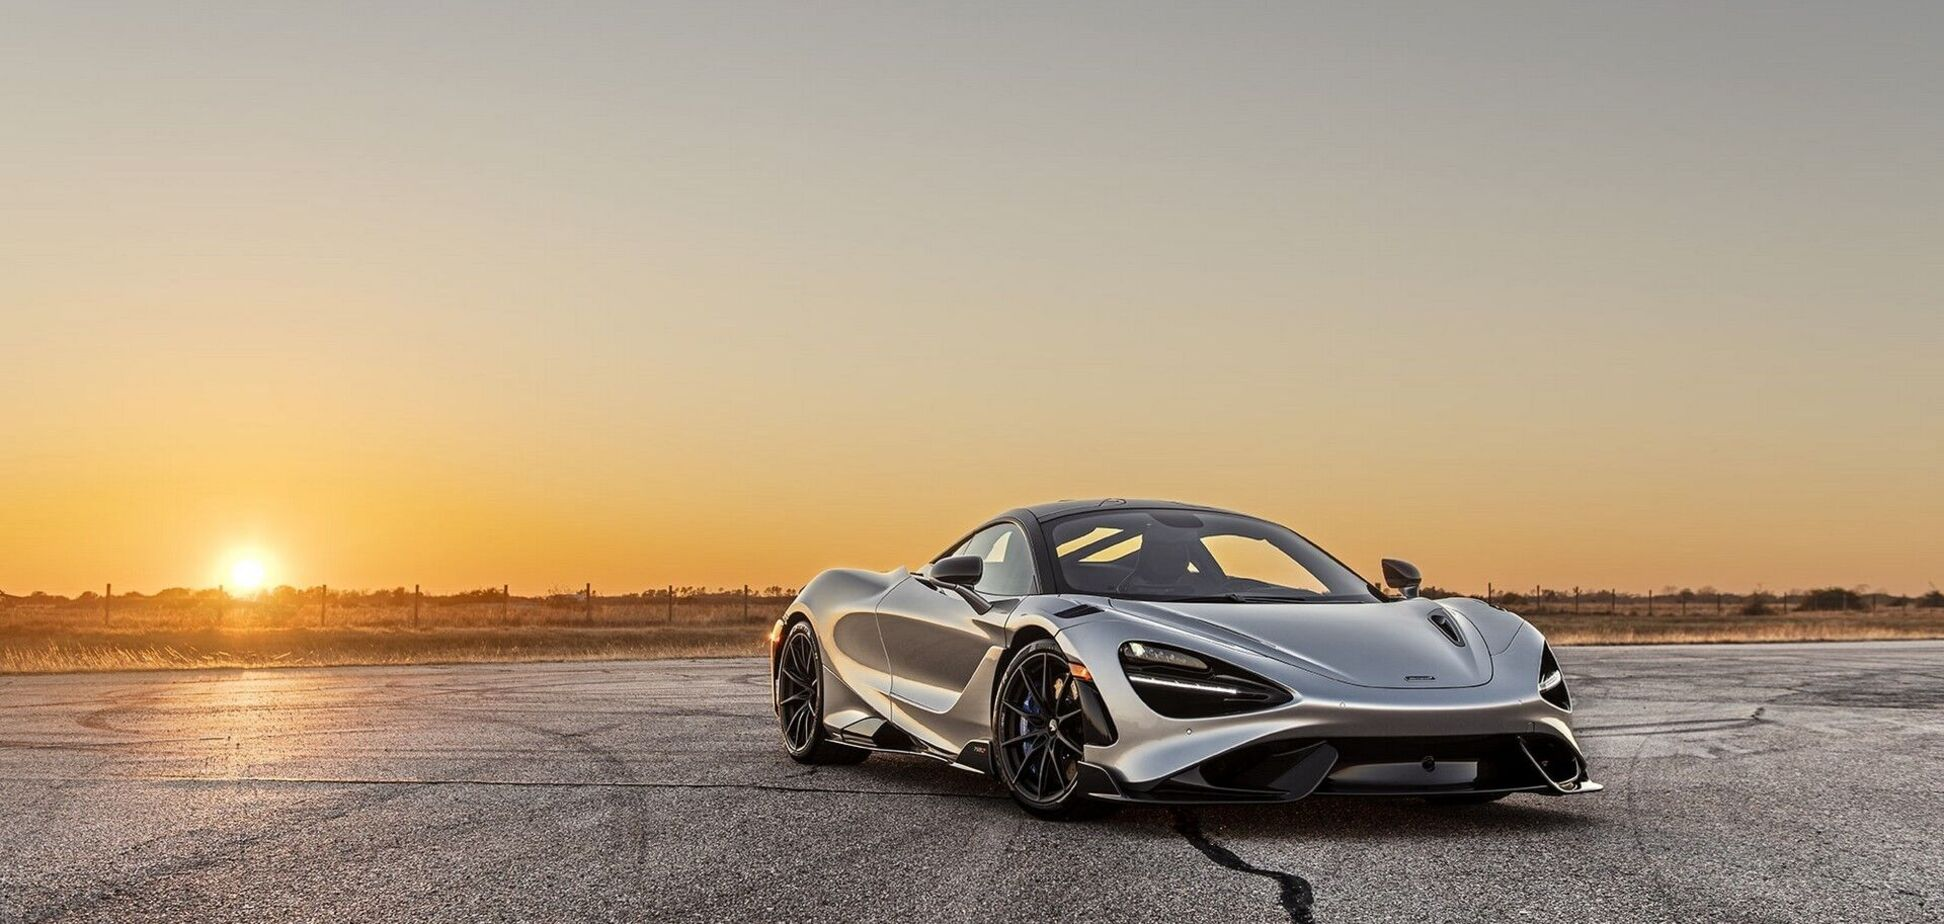 Hennessey 'прокачала' McLaren 765LT до 1015 к.с.